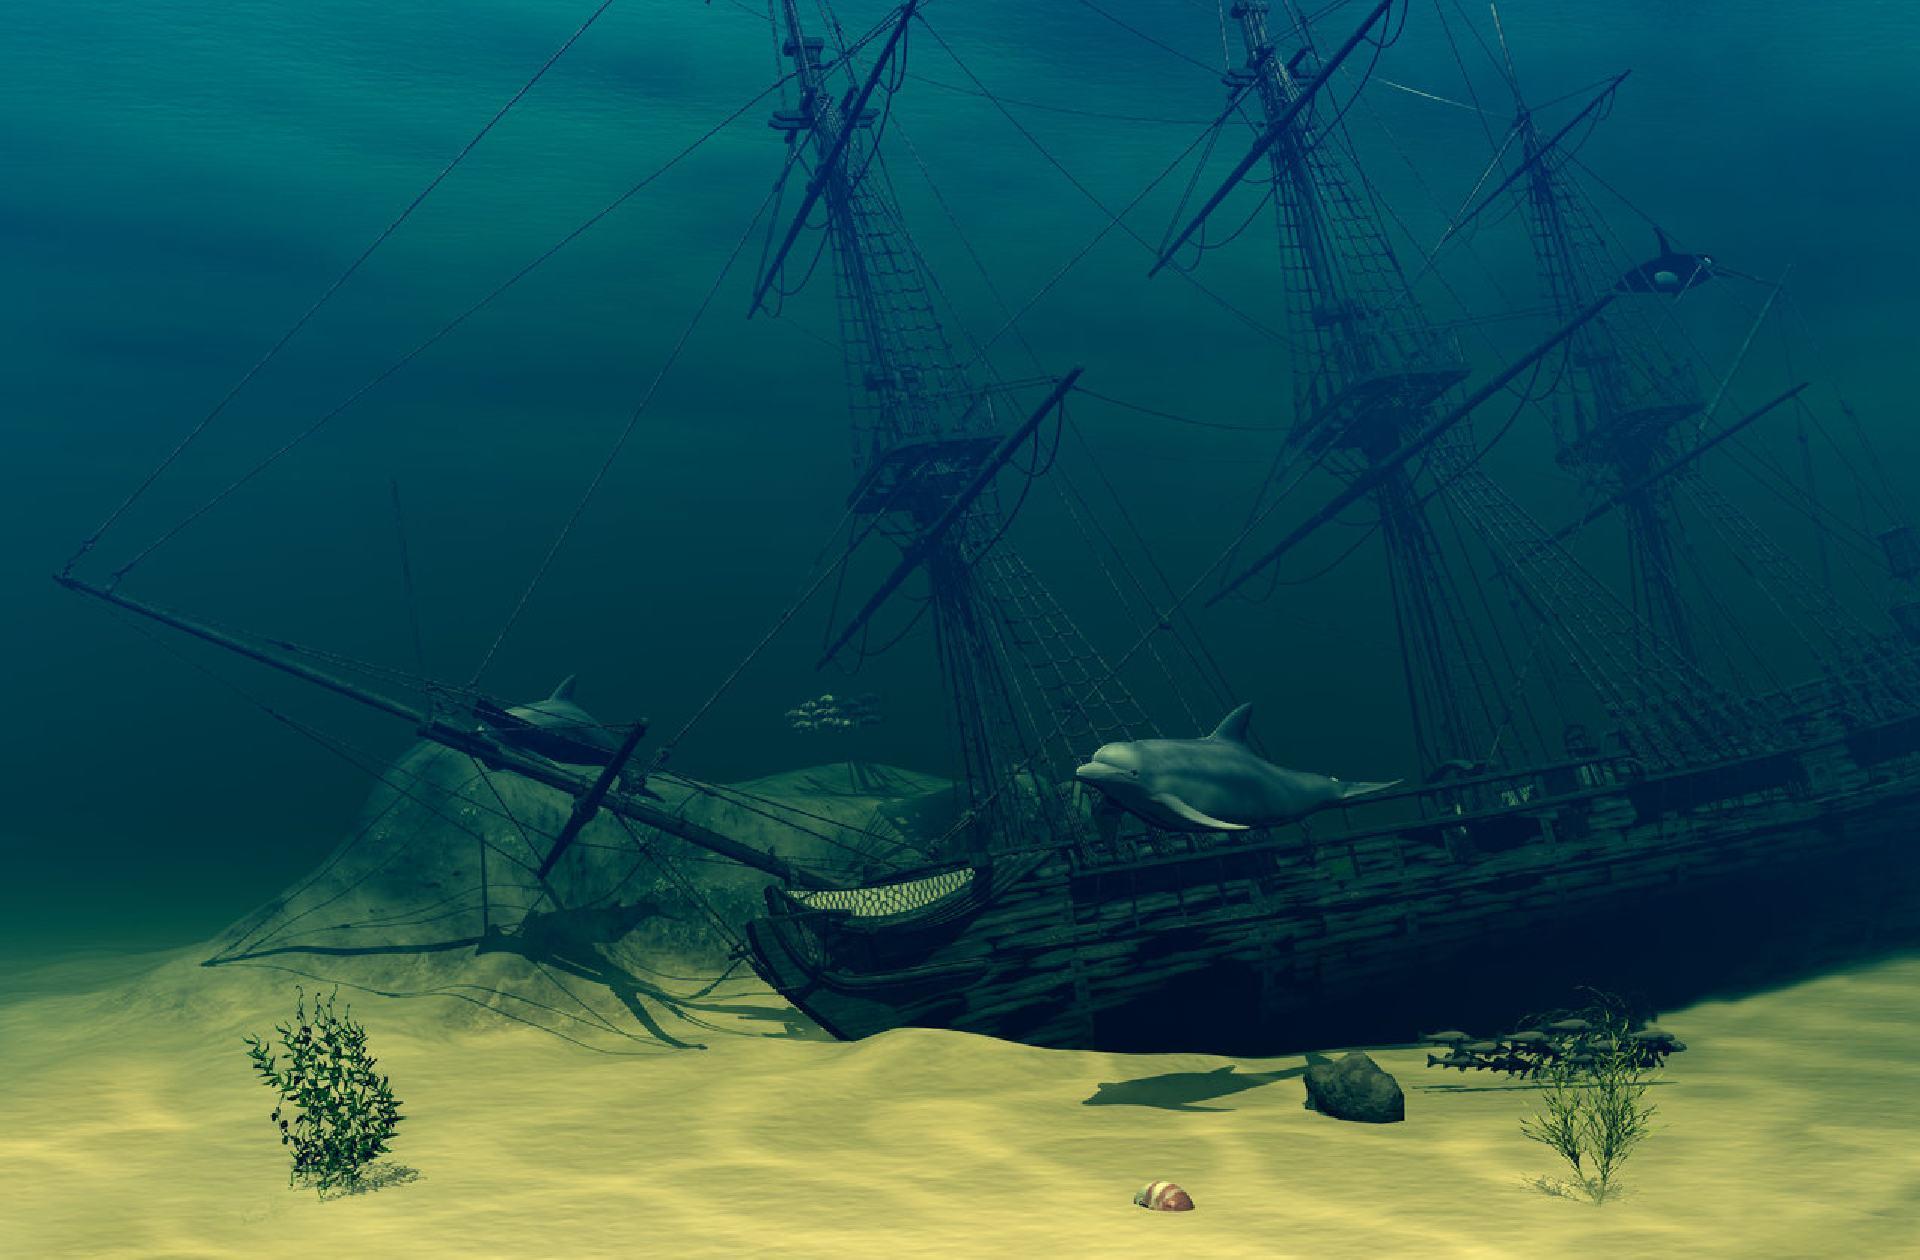 Pirate bay whorelore sexual tube